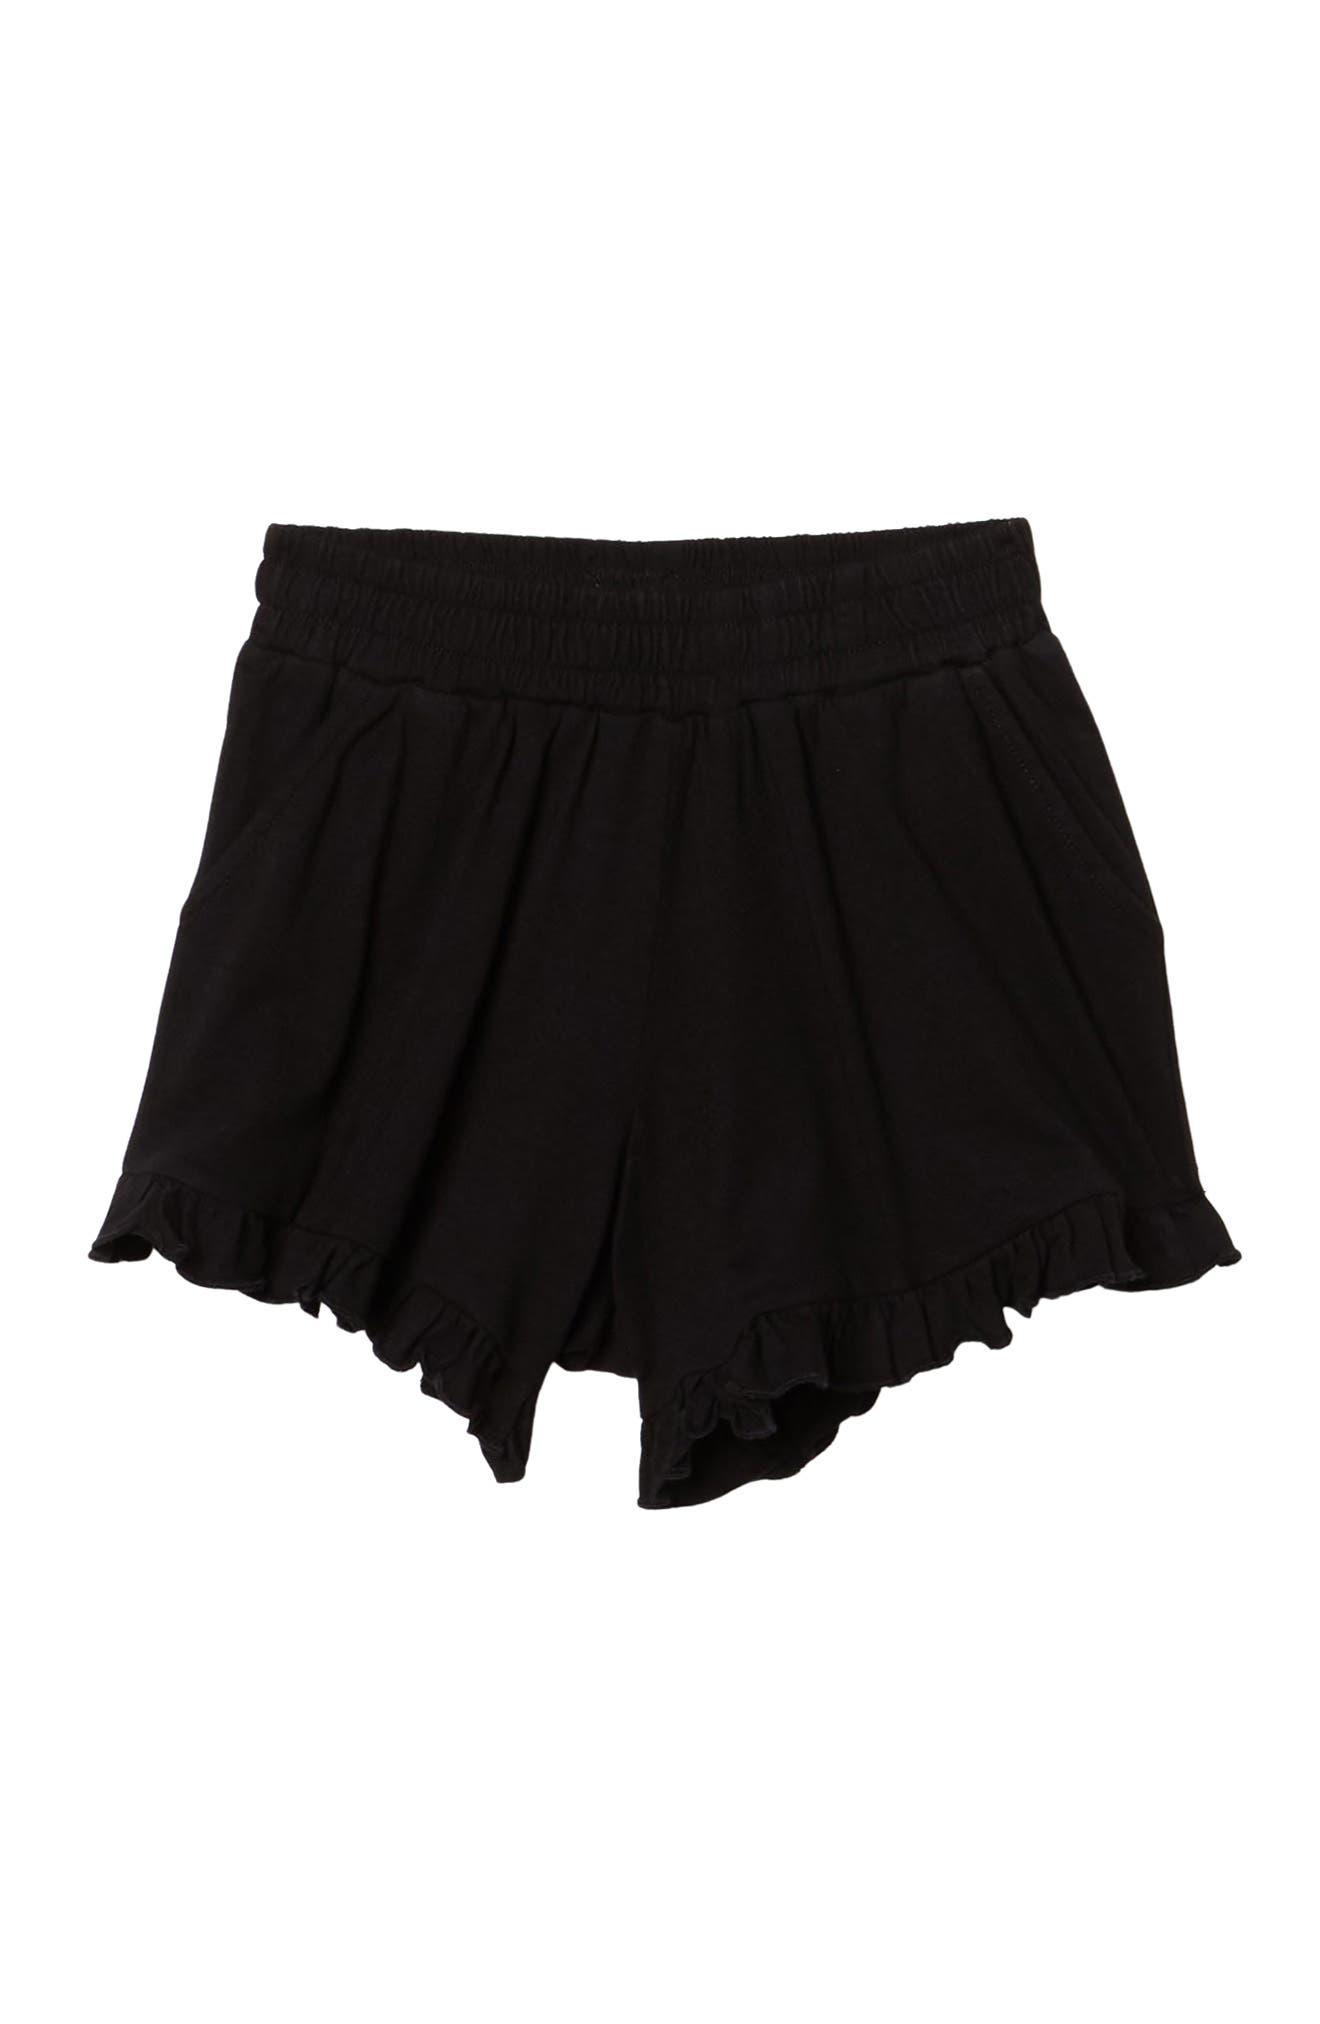 Image of Melrose and Market Ruffle Knit Shorts